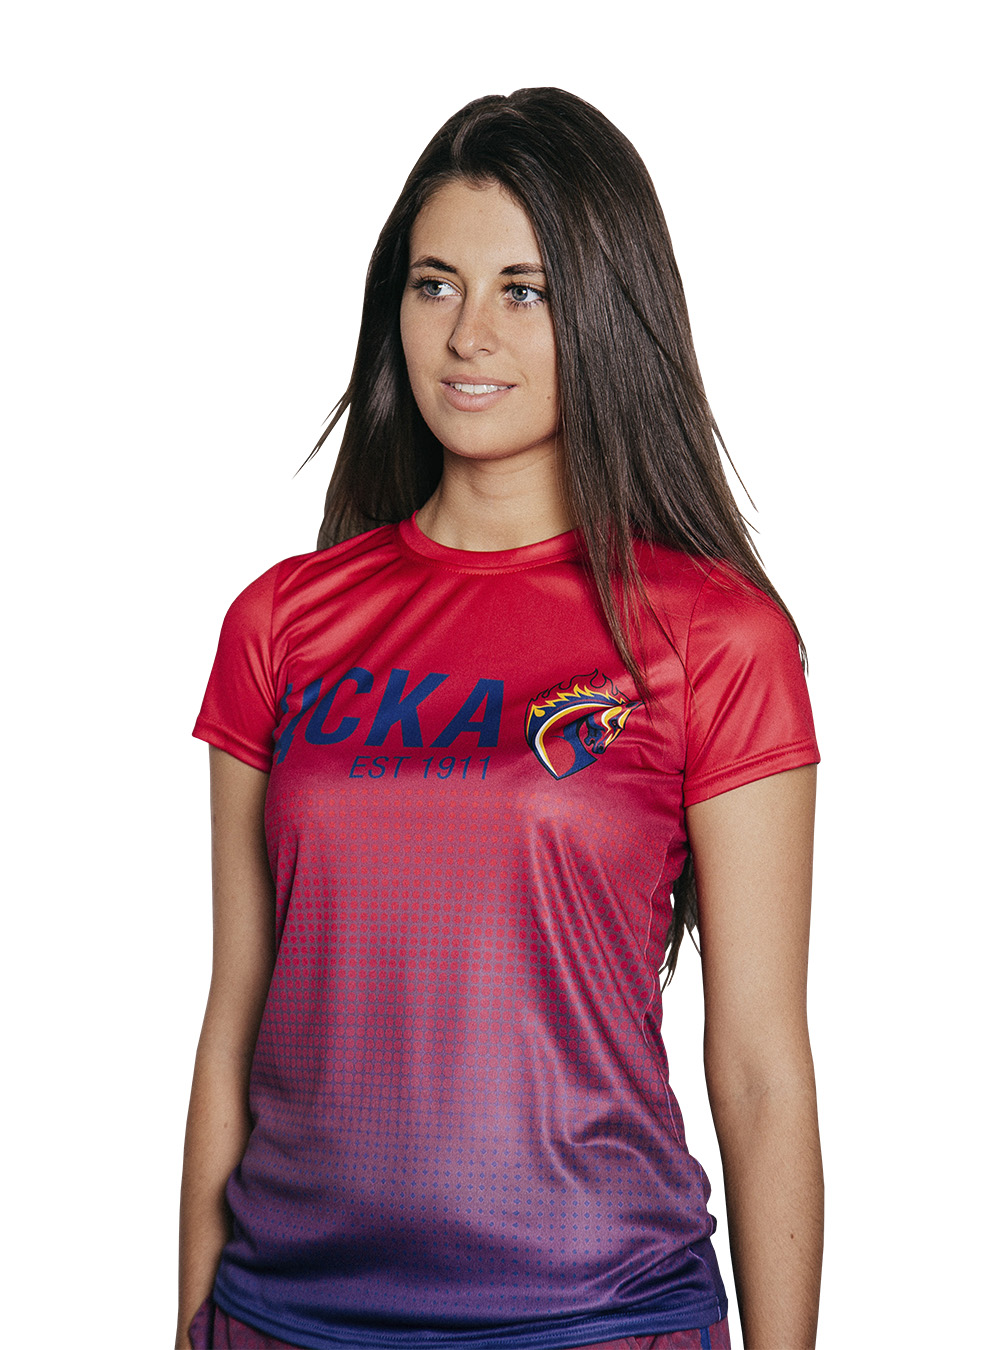 Футболка женская Градиент (S)Одежда на заказ<br>Футболка женская Градиент<br>